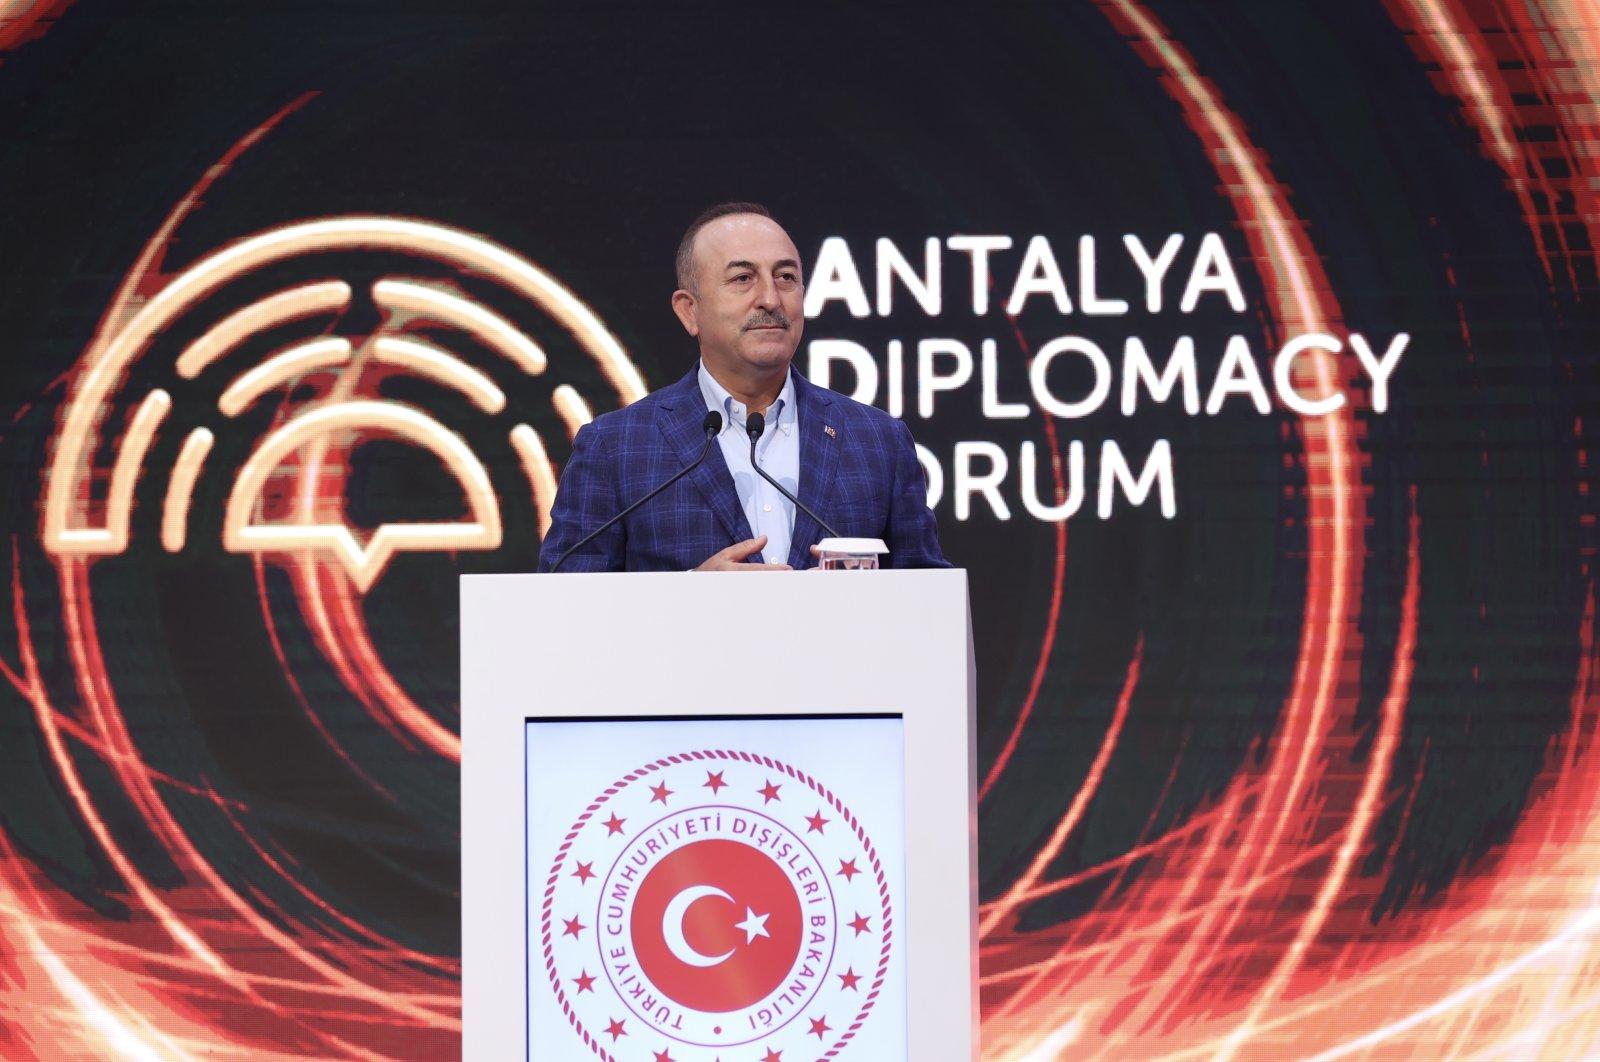 Foreign Minister Mevlüt Çavuşoğlu speaks at the Antalya Diplomacy Forum, Antalya, Turkey, June 20, 2021 (AA Photo)